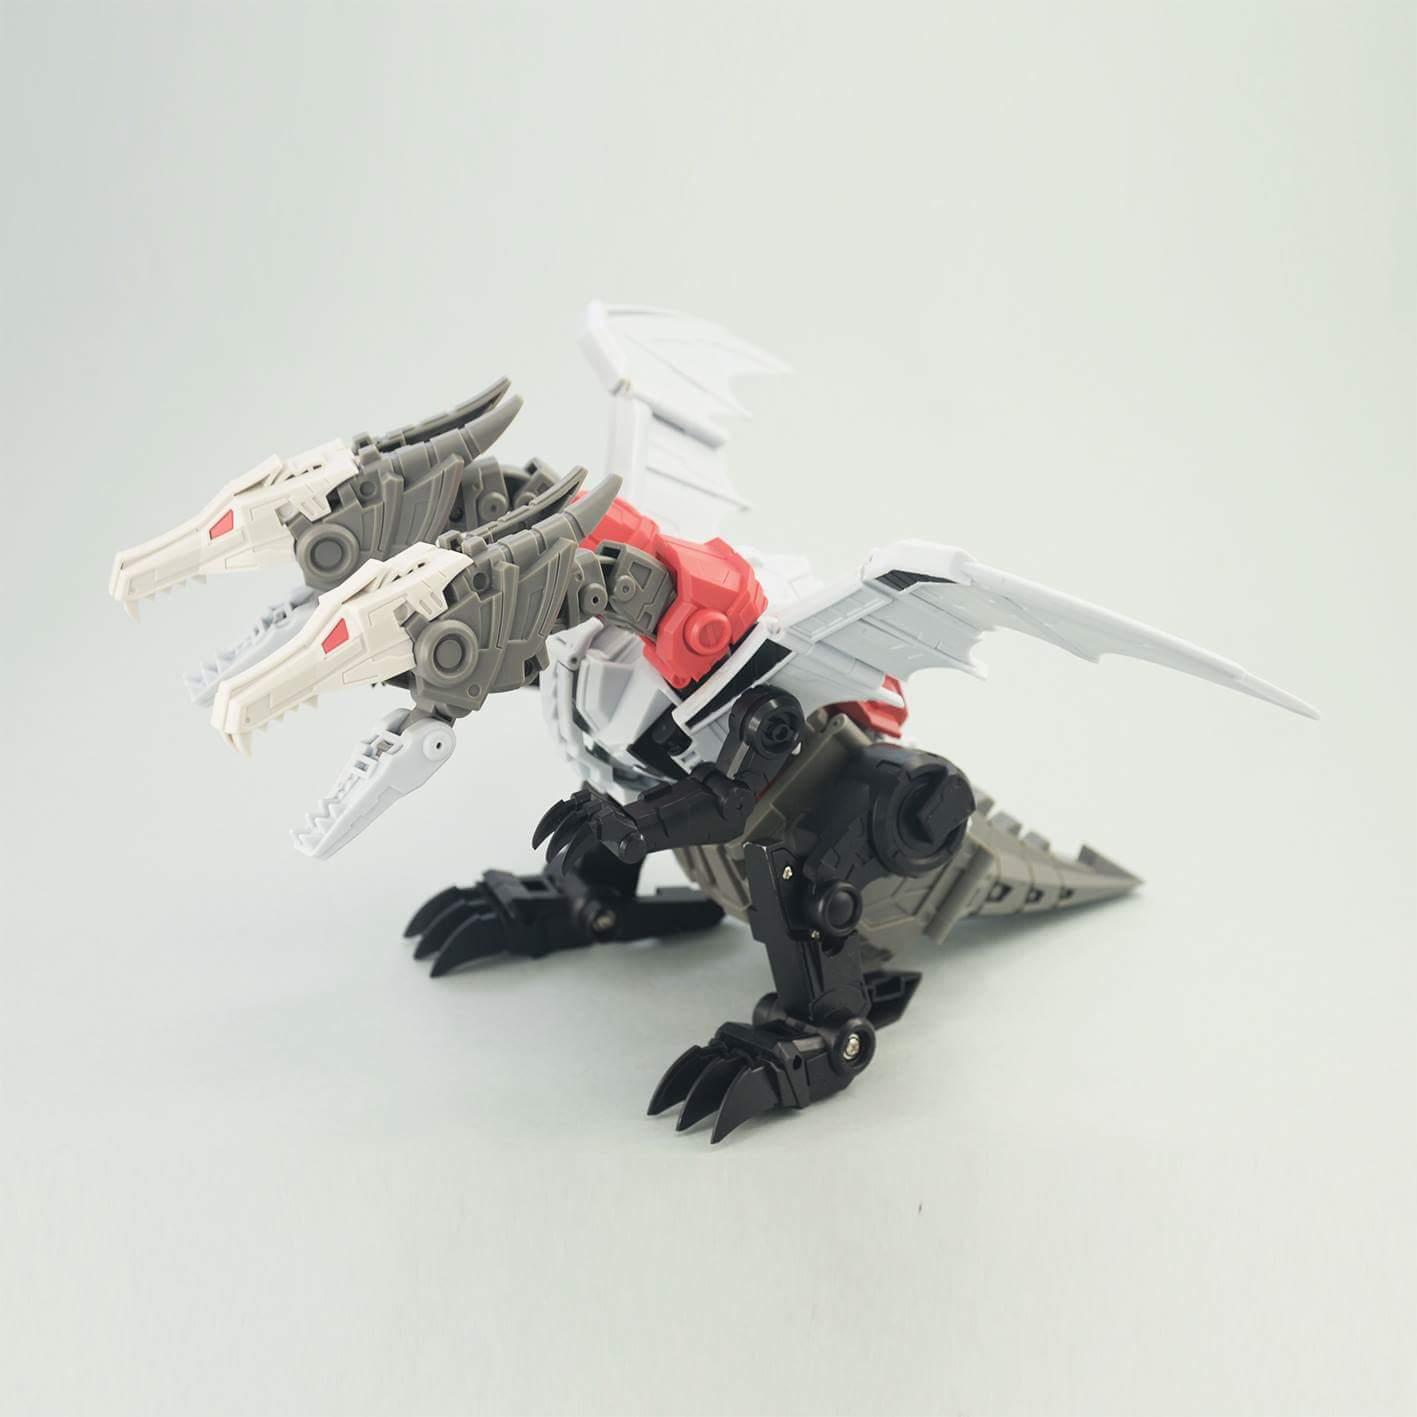 [FansHobby] Produit Tiers - Master Builder MB-02/03/05 - aka Monsterbots/Monstrebots - Page 2 H4MliGyi